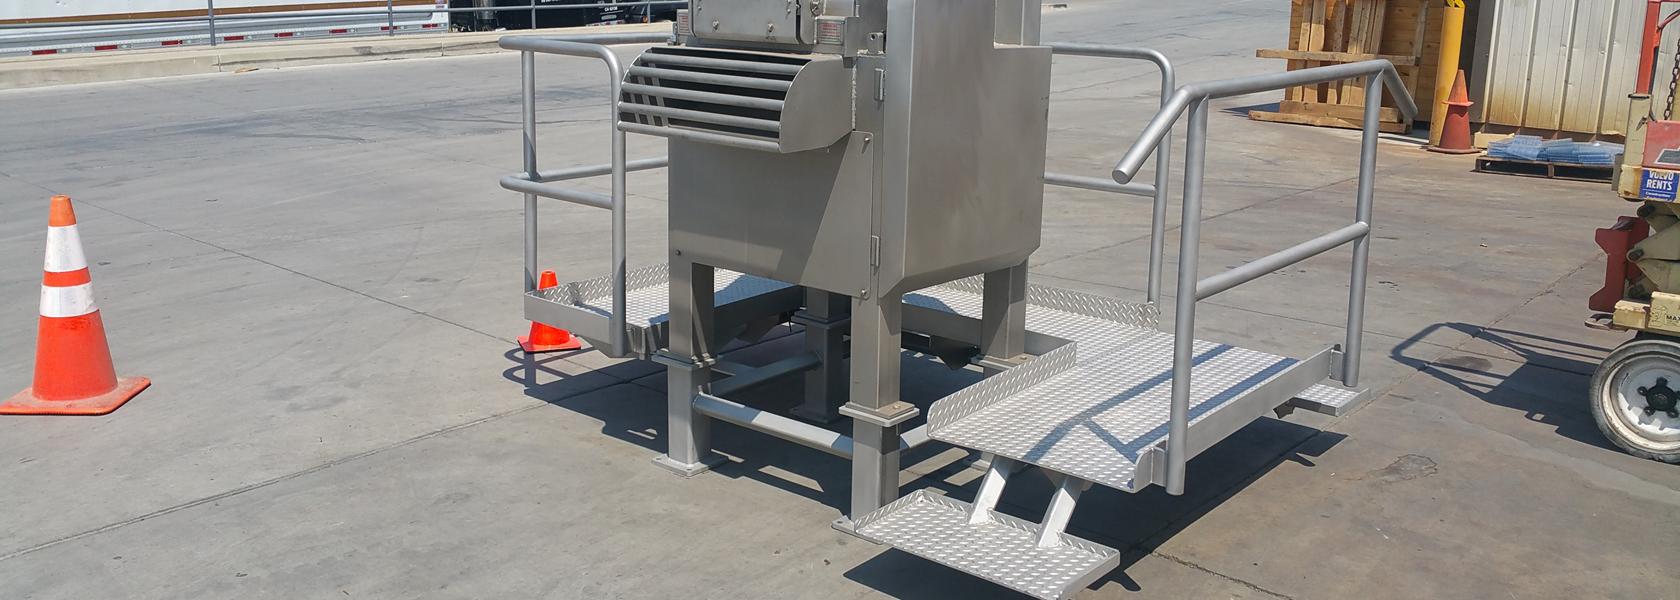 PH-Header-AMI Sanitary Work Stand-002.jpg